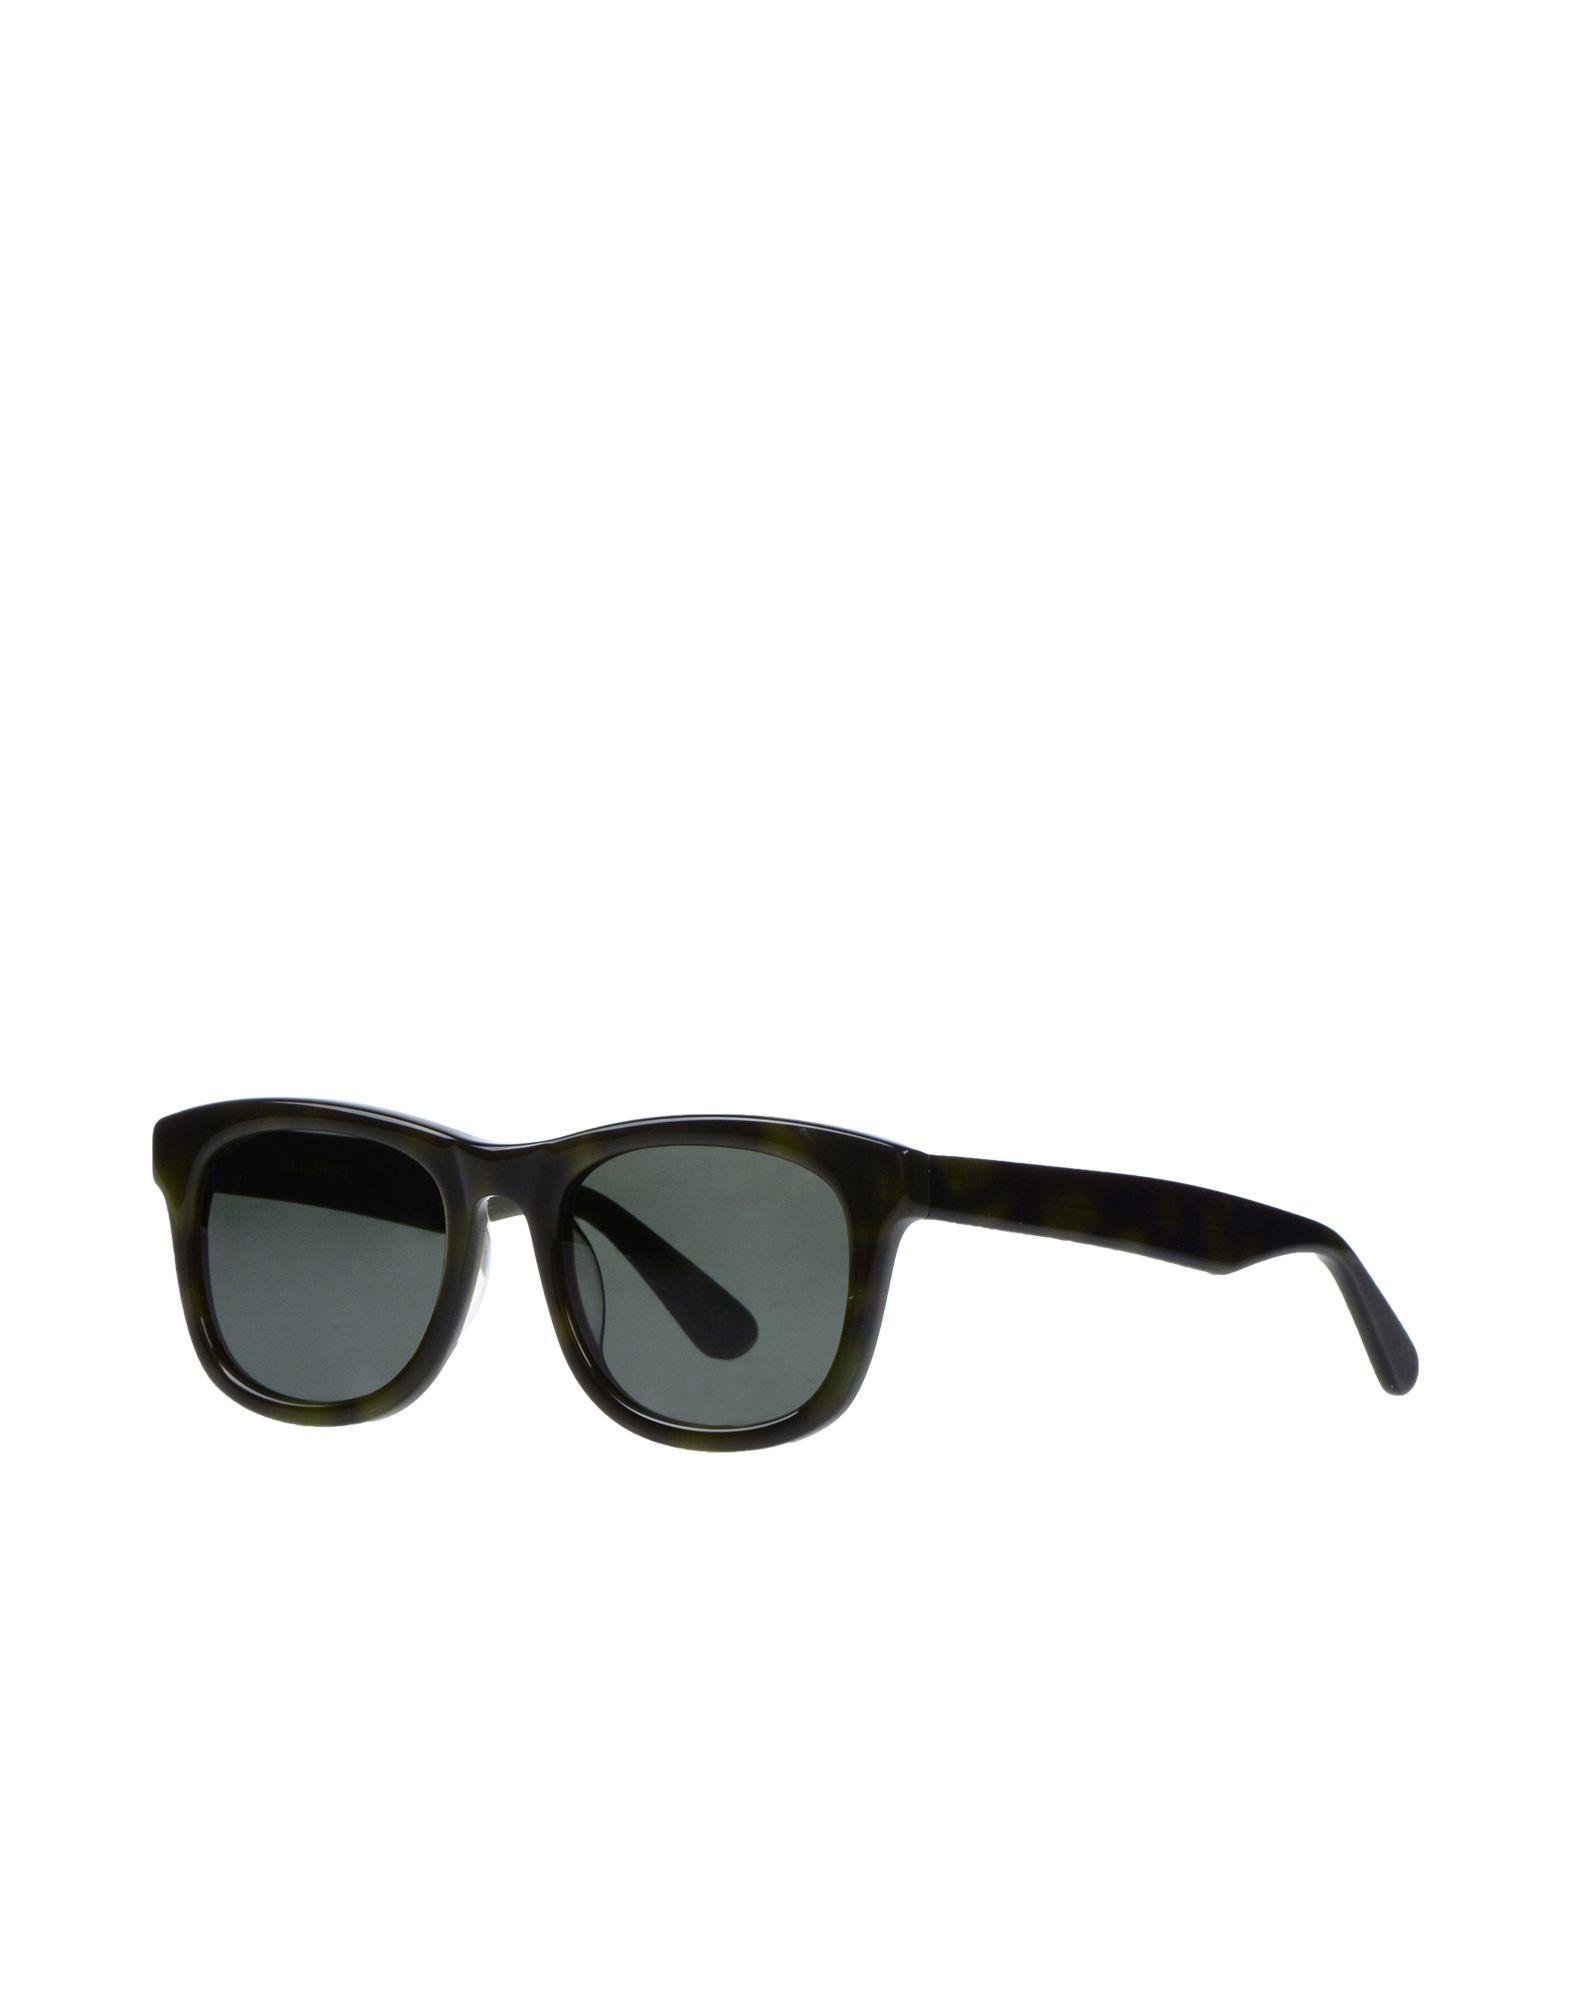 HAN KJØBENHAVN Солнечные очки